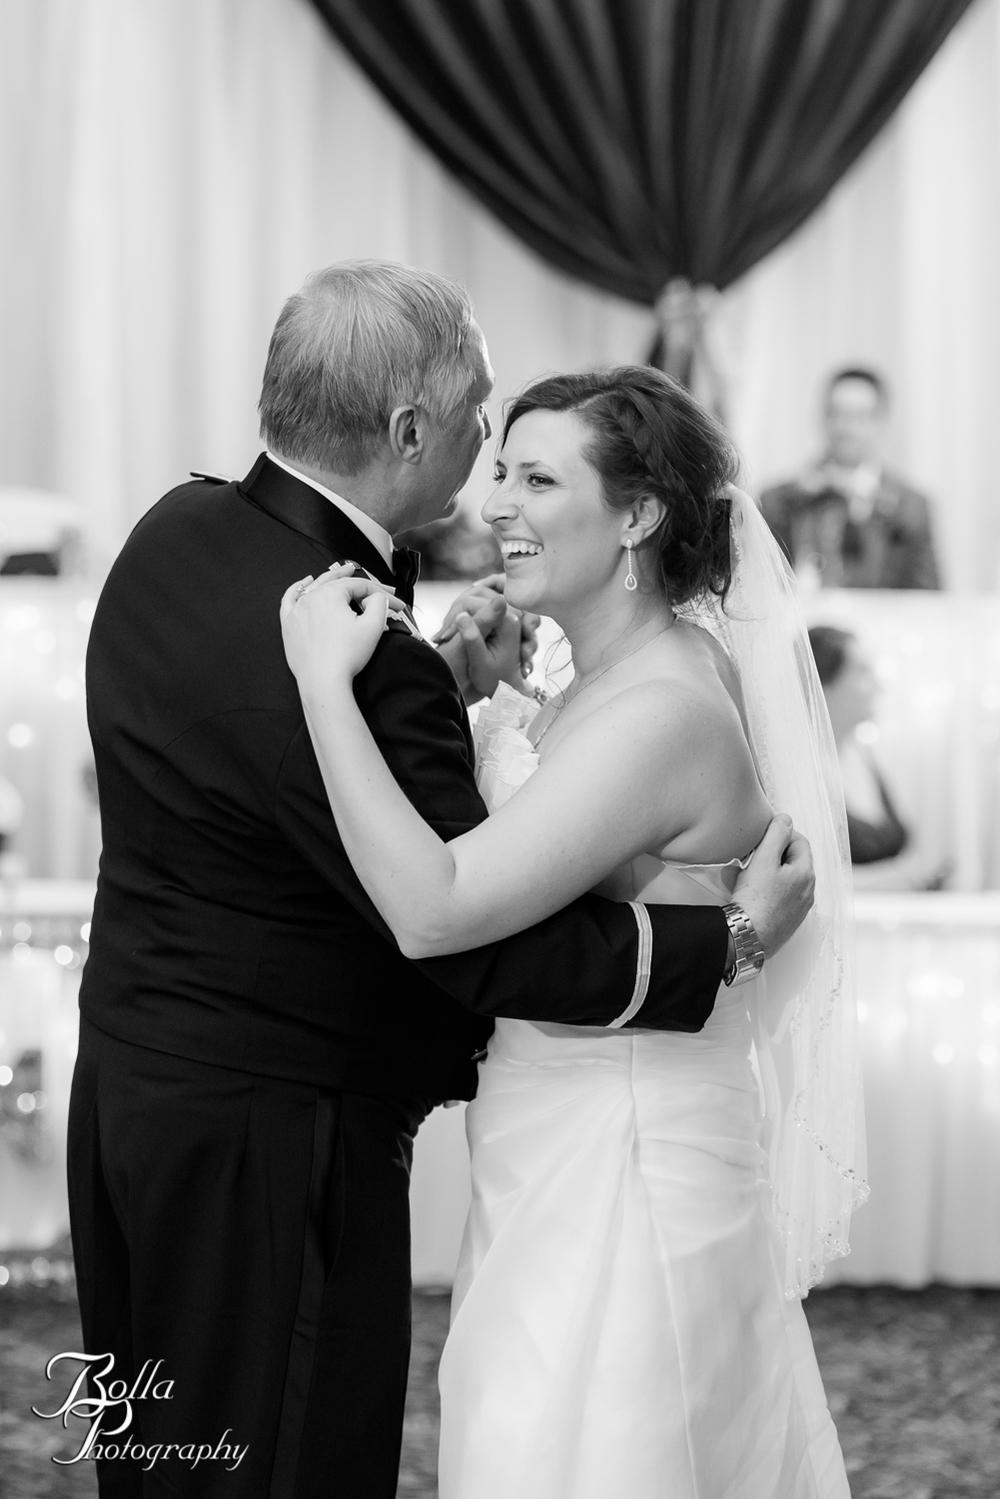 Bolla_Photography_St_Louis_wedding_photographer-0465.jpg